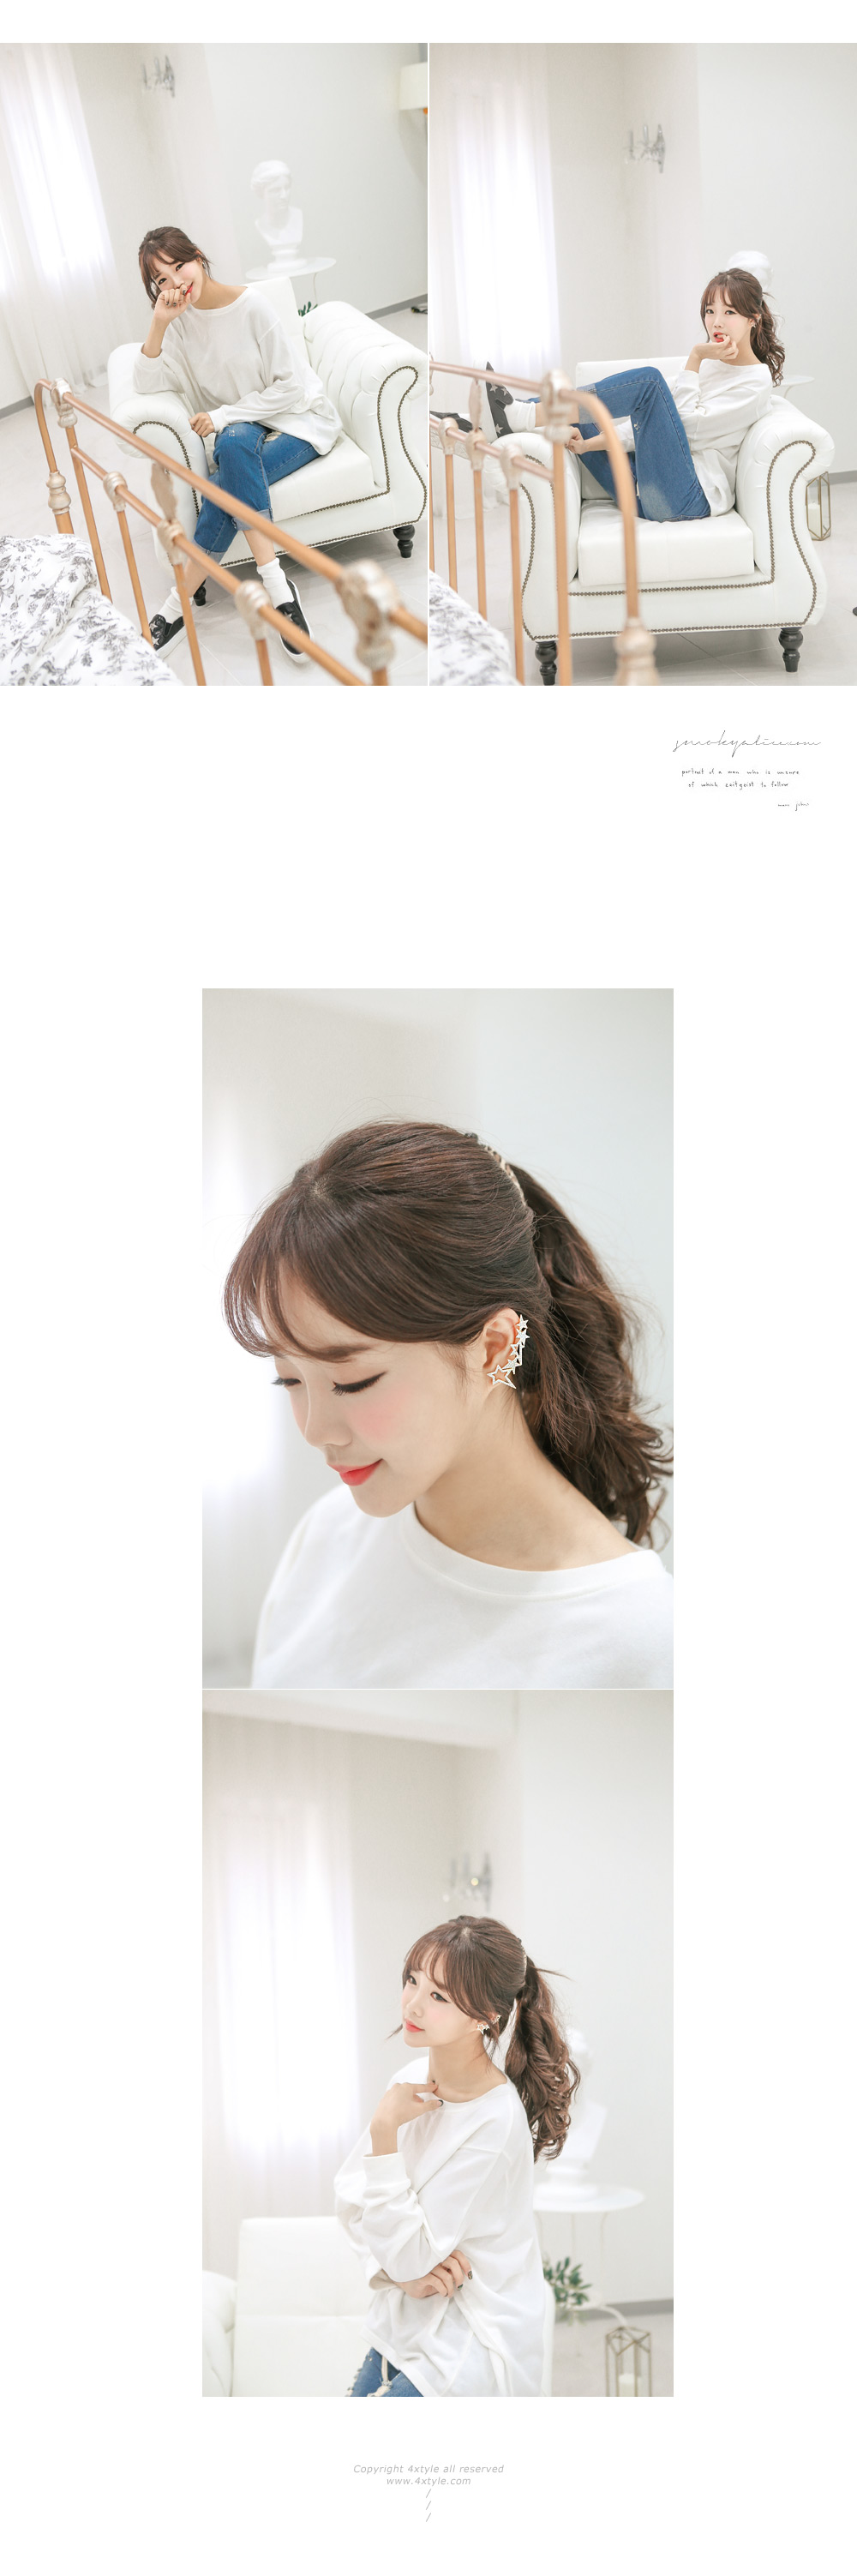 [ 4xtyle ] 耳Etwal袖带,2种颜色